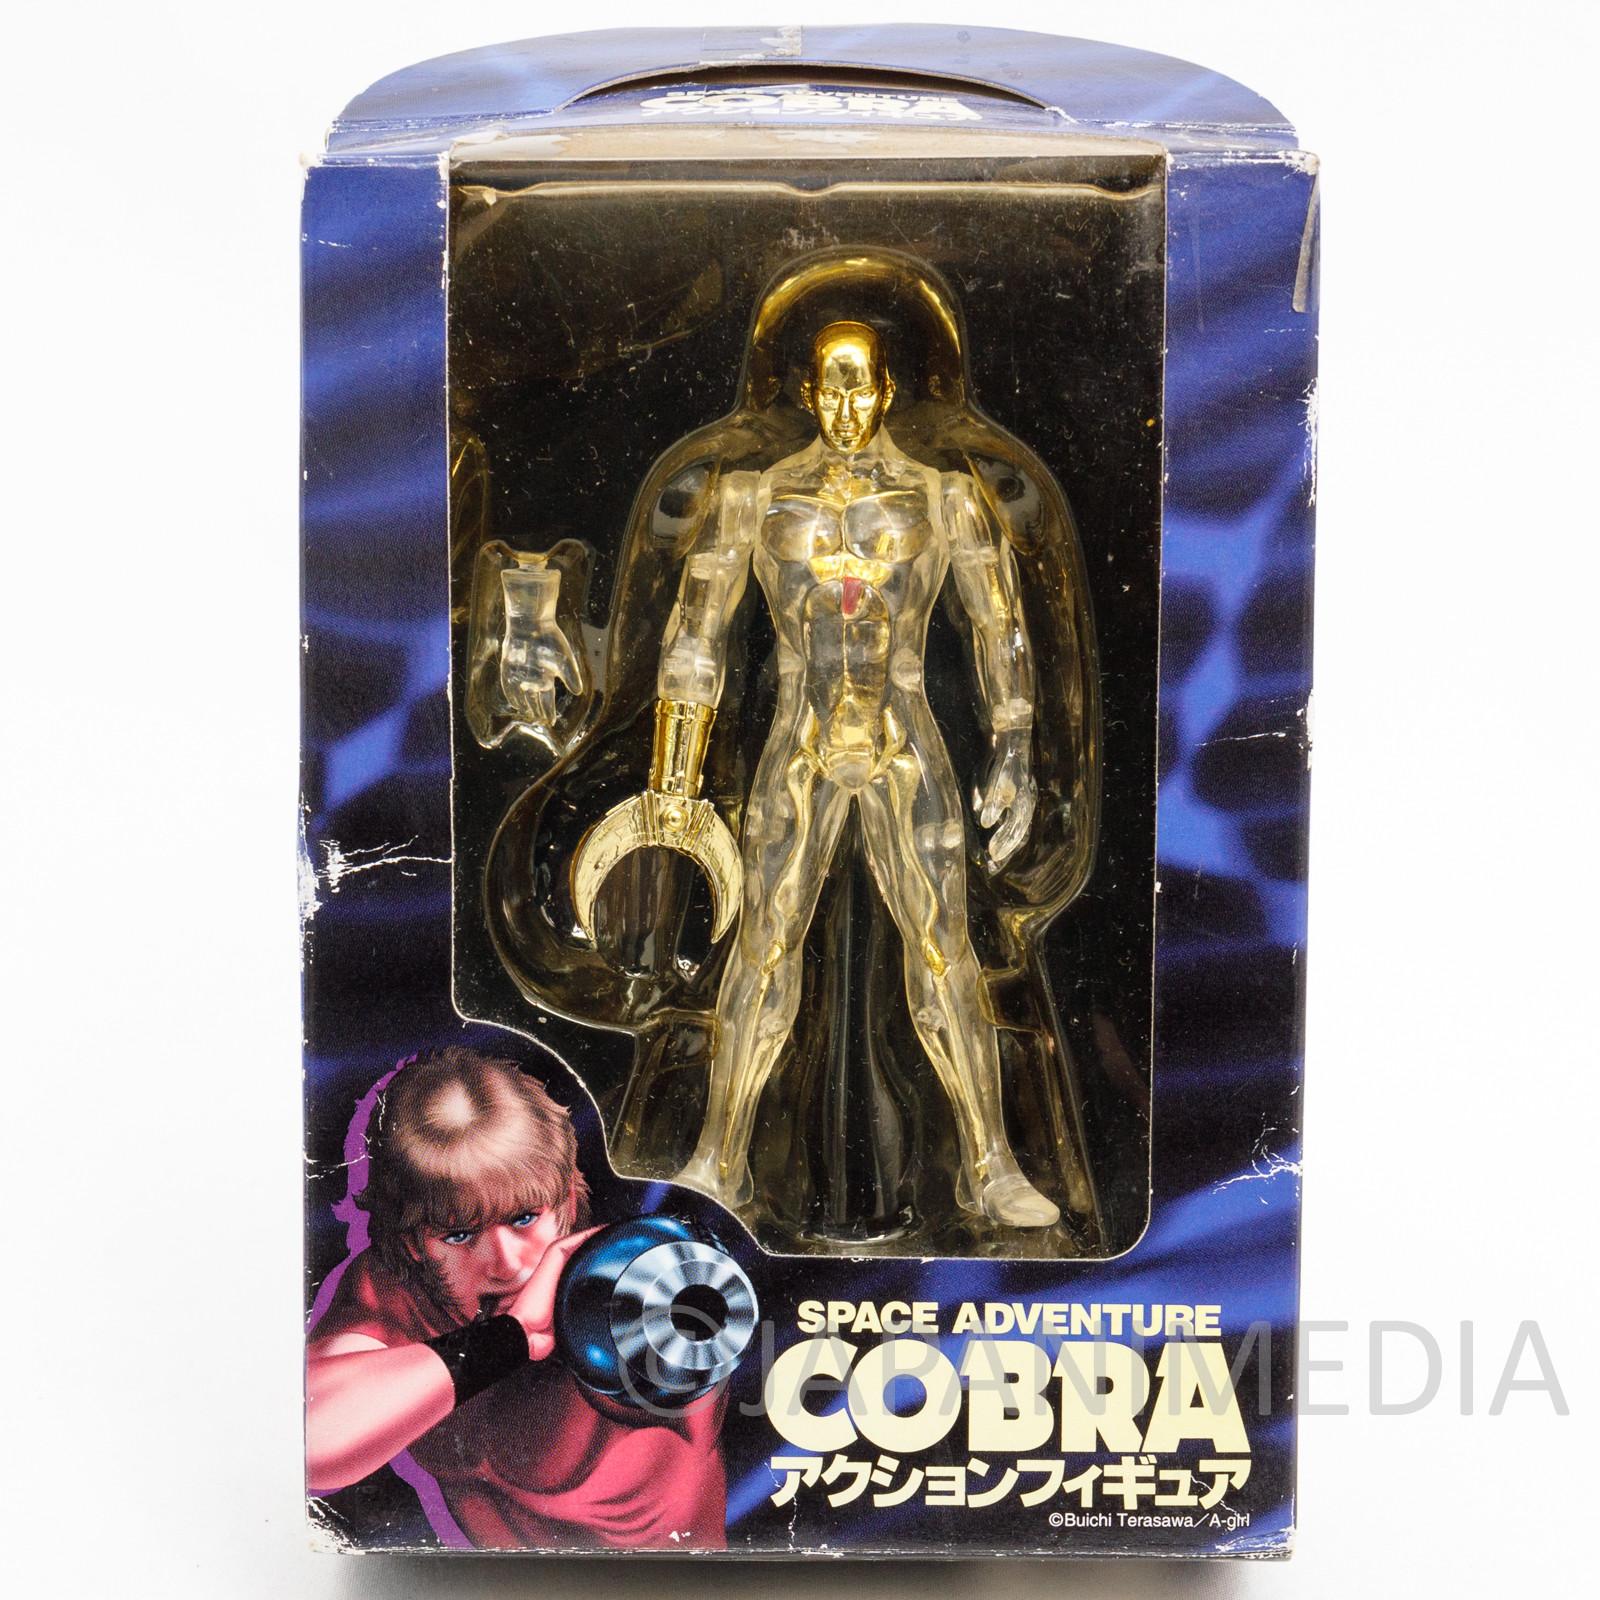 Space Adventure Cobra Crystal Boy Action Figure Banpresto JAPAN ANIME MANGA